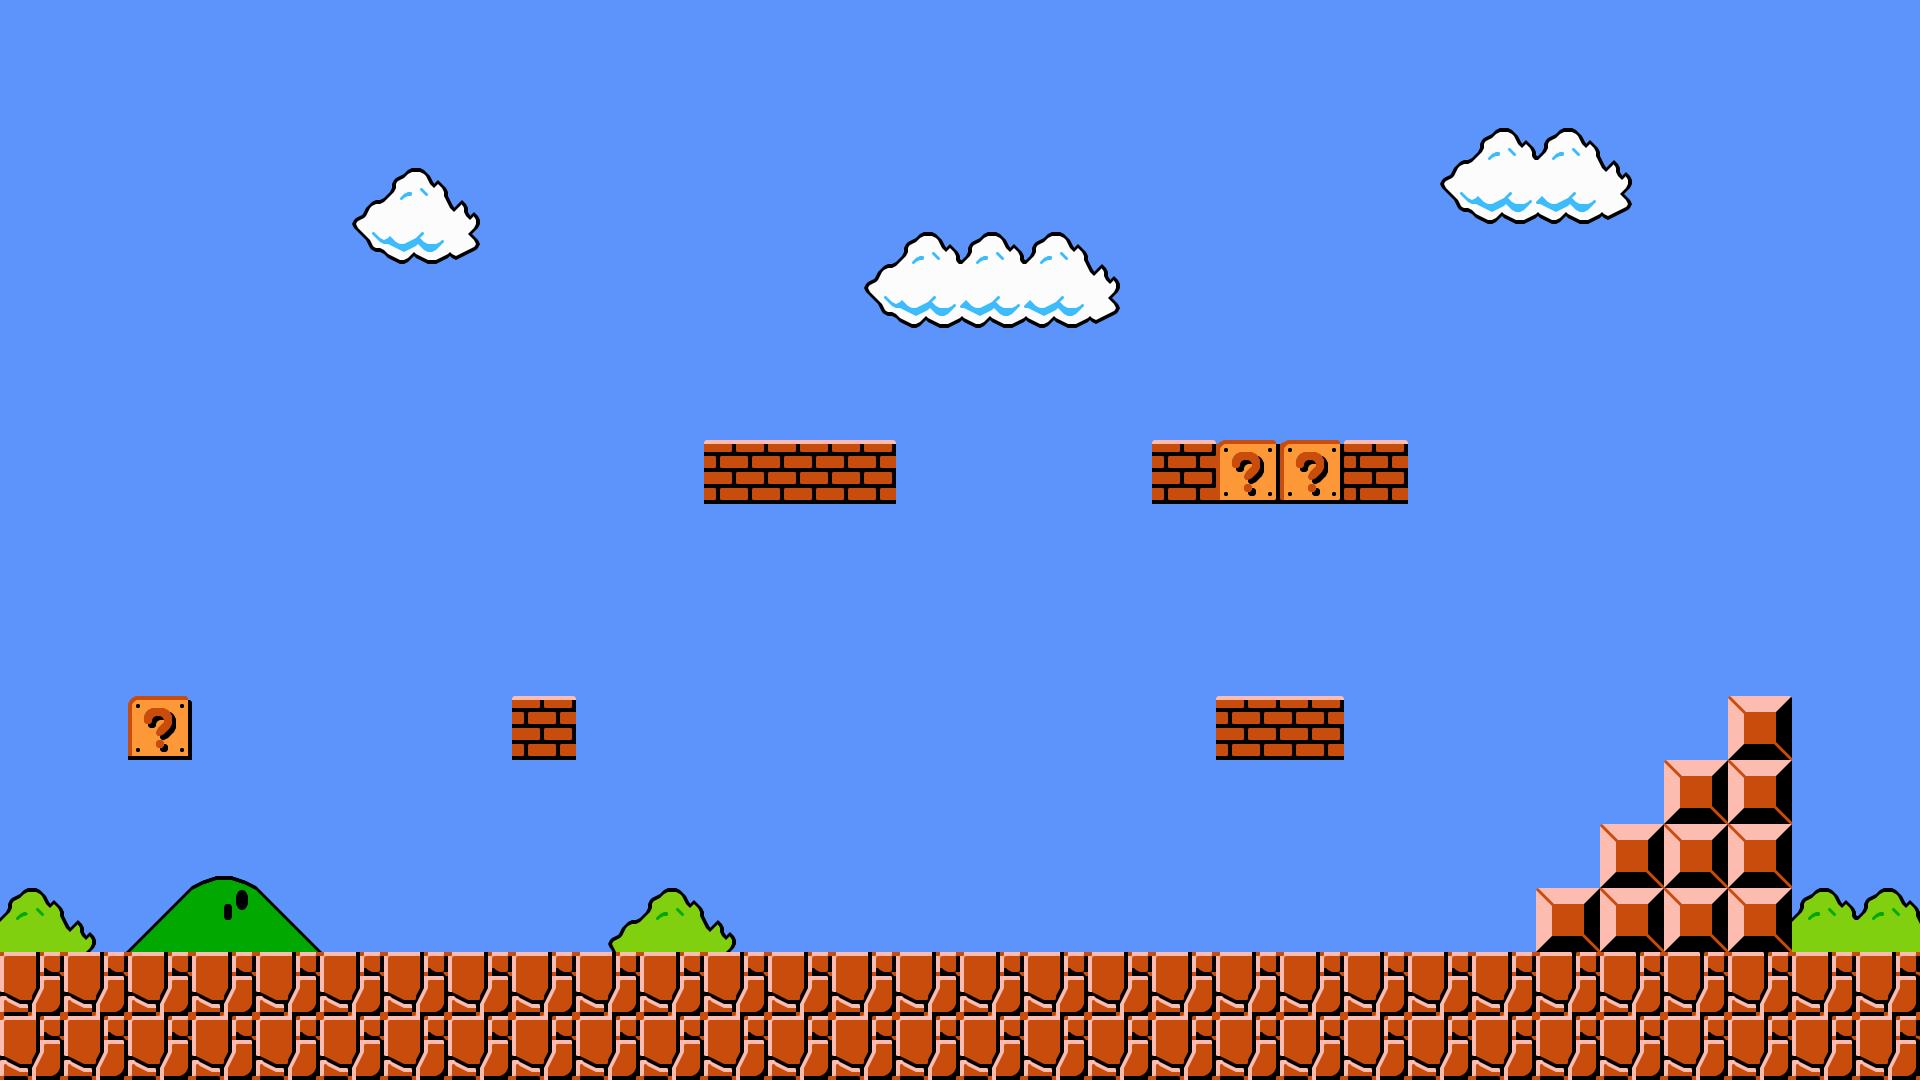 Super Mario Bros 1 1 Wallpaper Hd Flat By Wougie89 On Deviantart